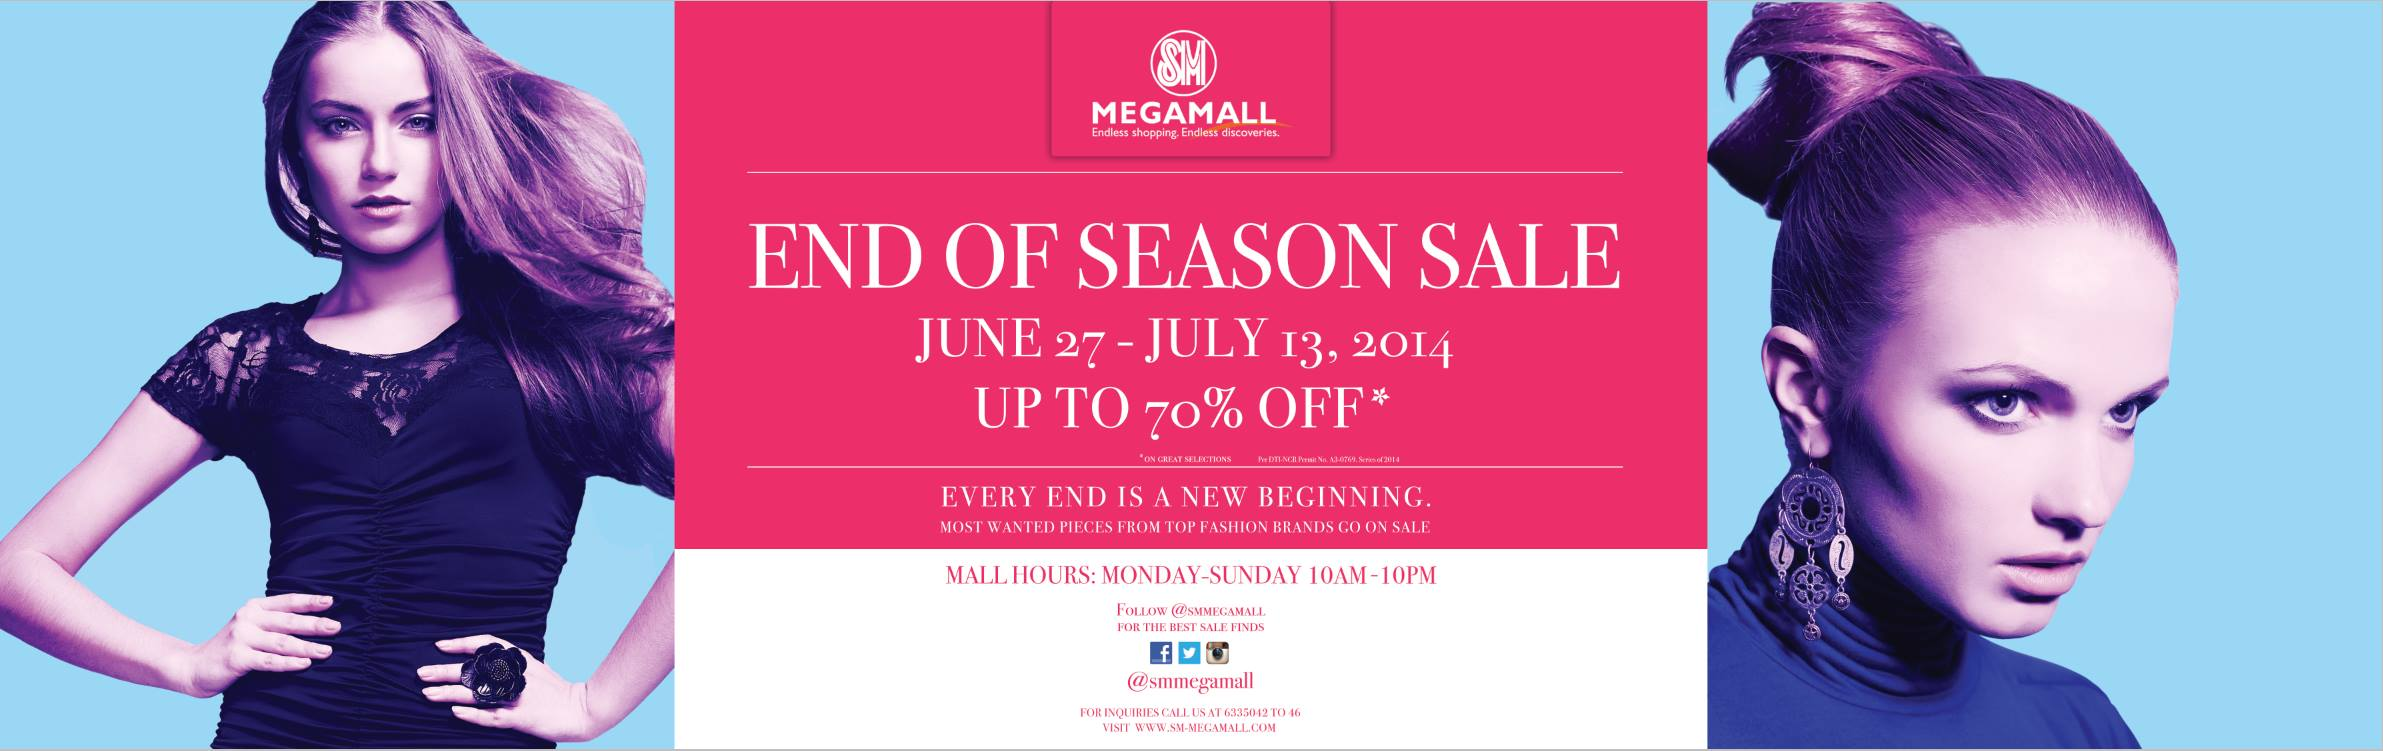 SM Megamall End of Season Sale June - July 2014